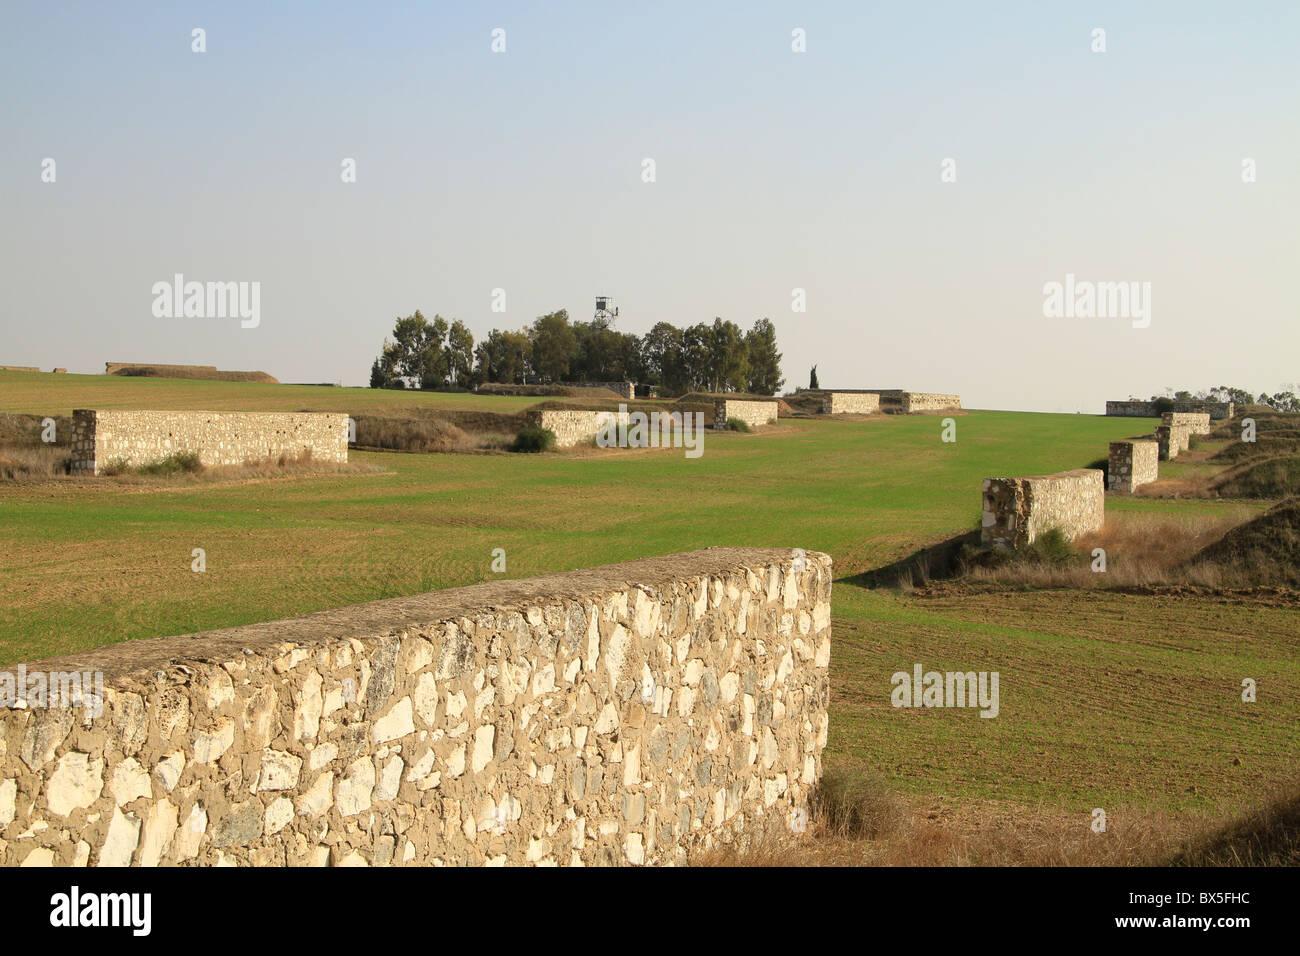 Israel, Negev, an abandoned British ammunition dump in Beeri - Stock Image